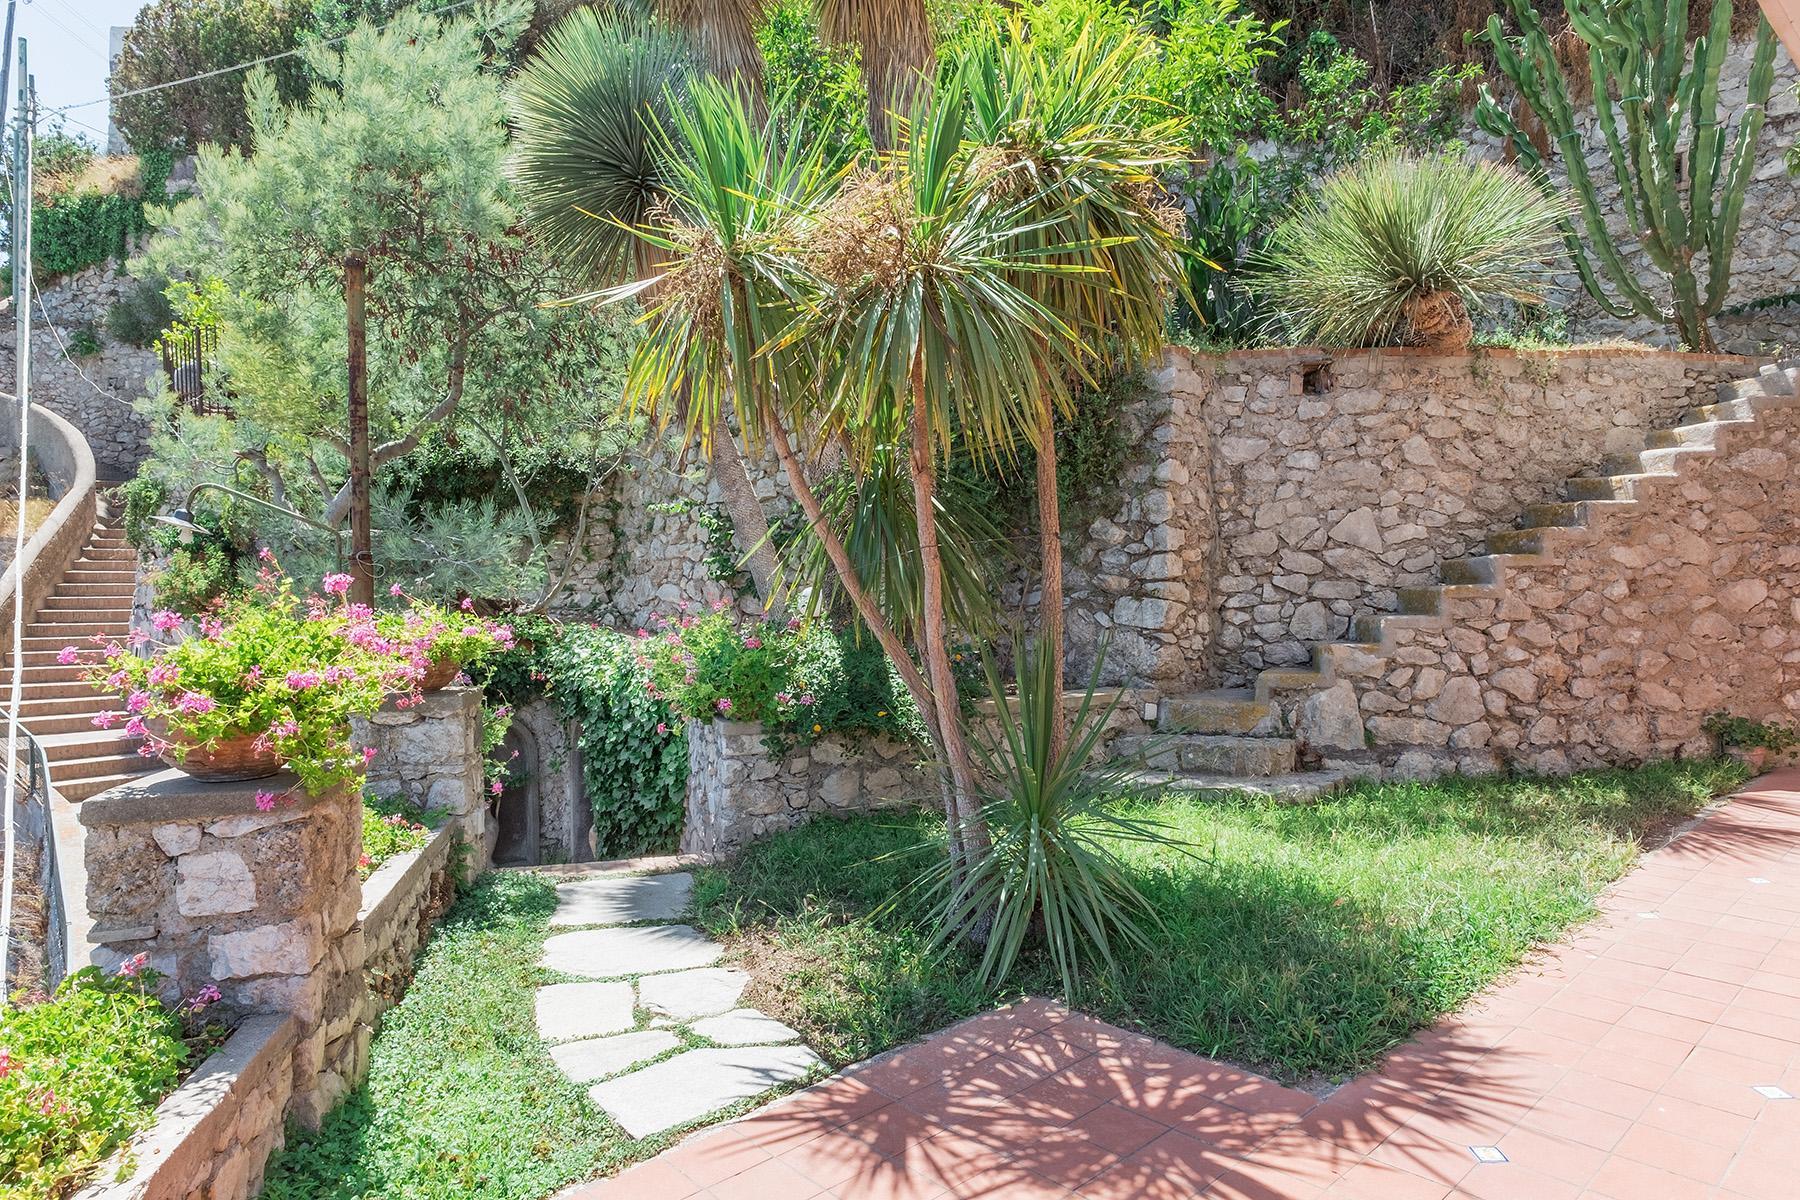 Прекрасная вилла с панорамным видом на море в центре легендарного острова Капри, Италия - 19